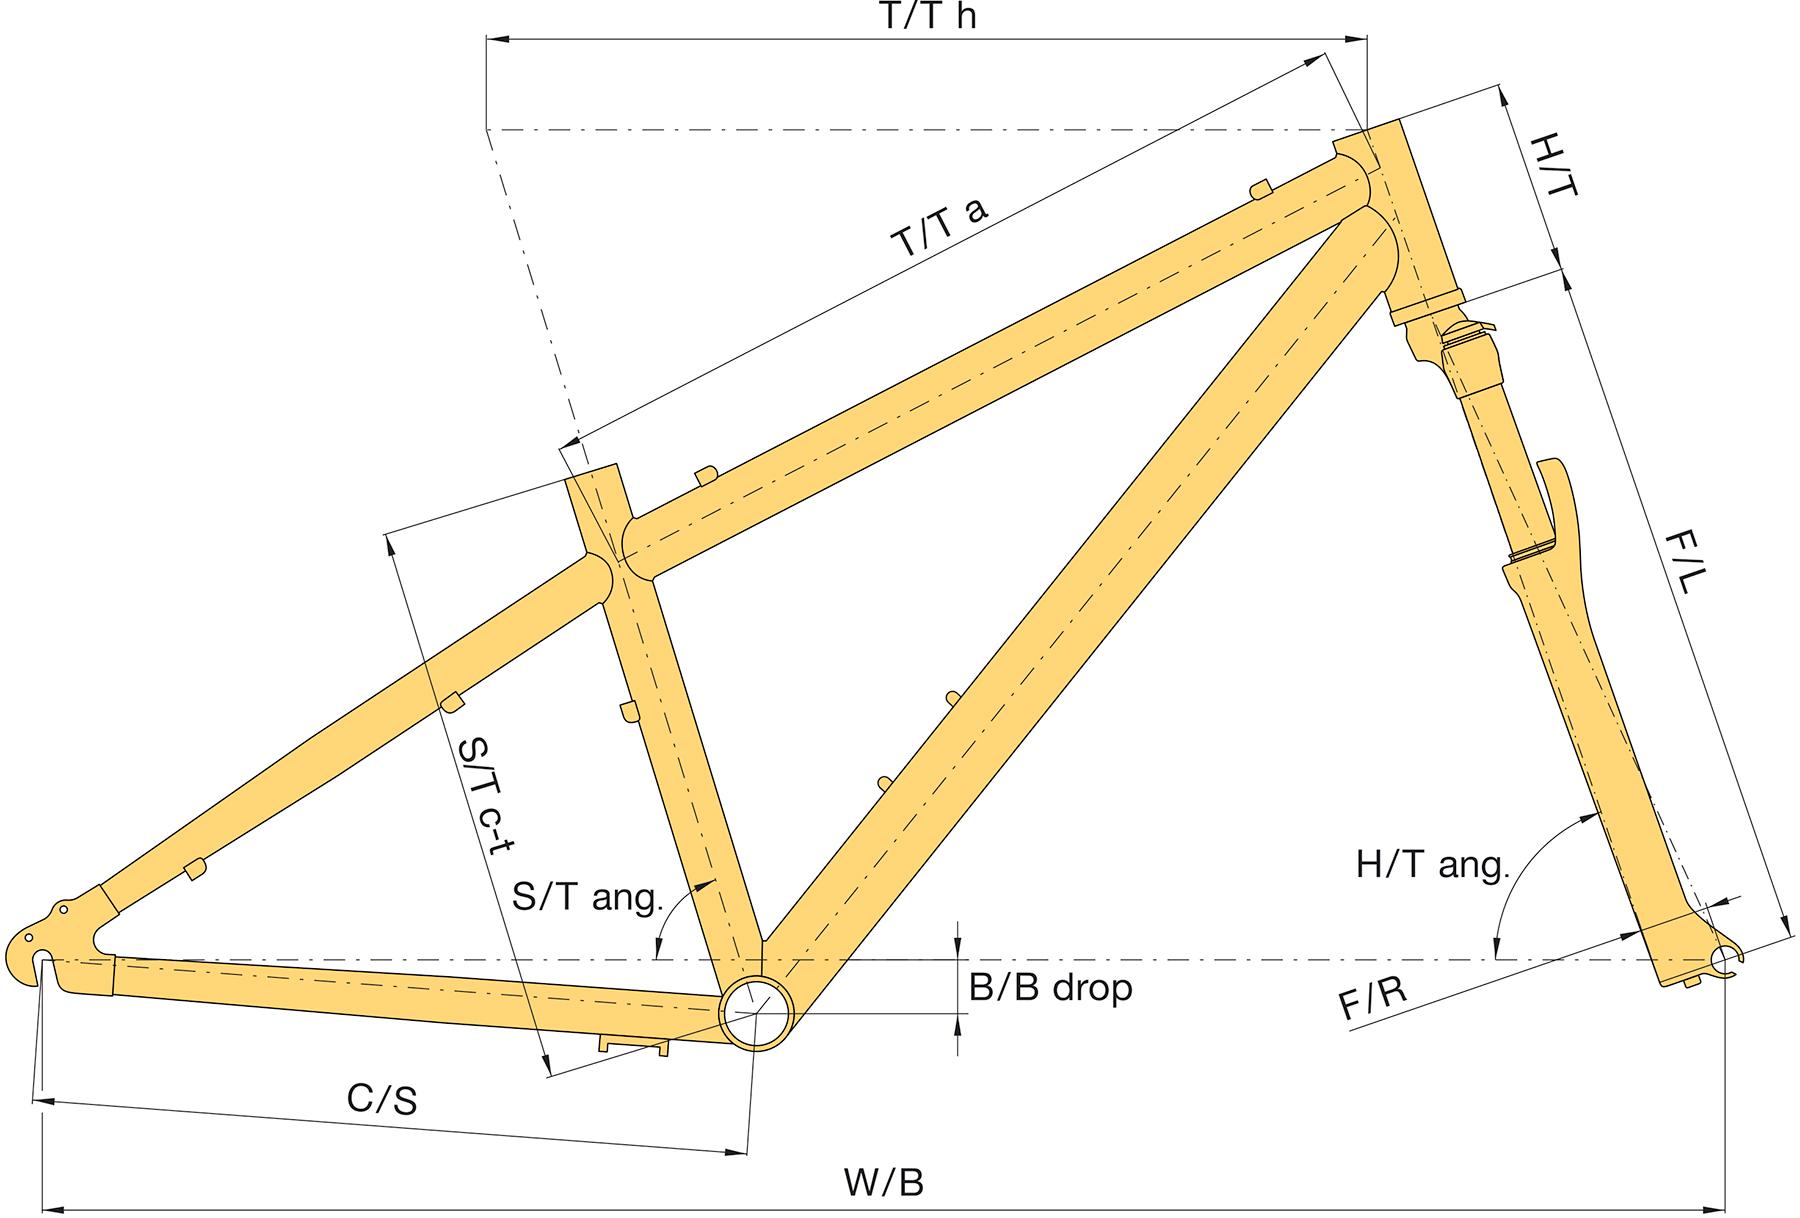 AUTHOR Bello 16 - geometria